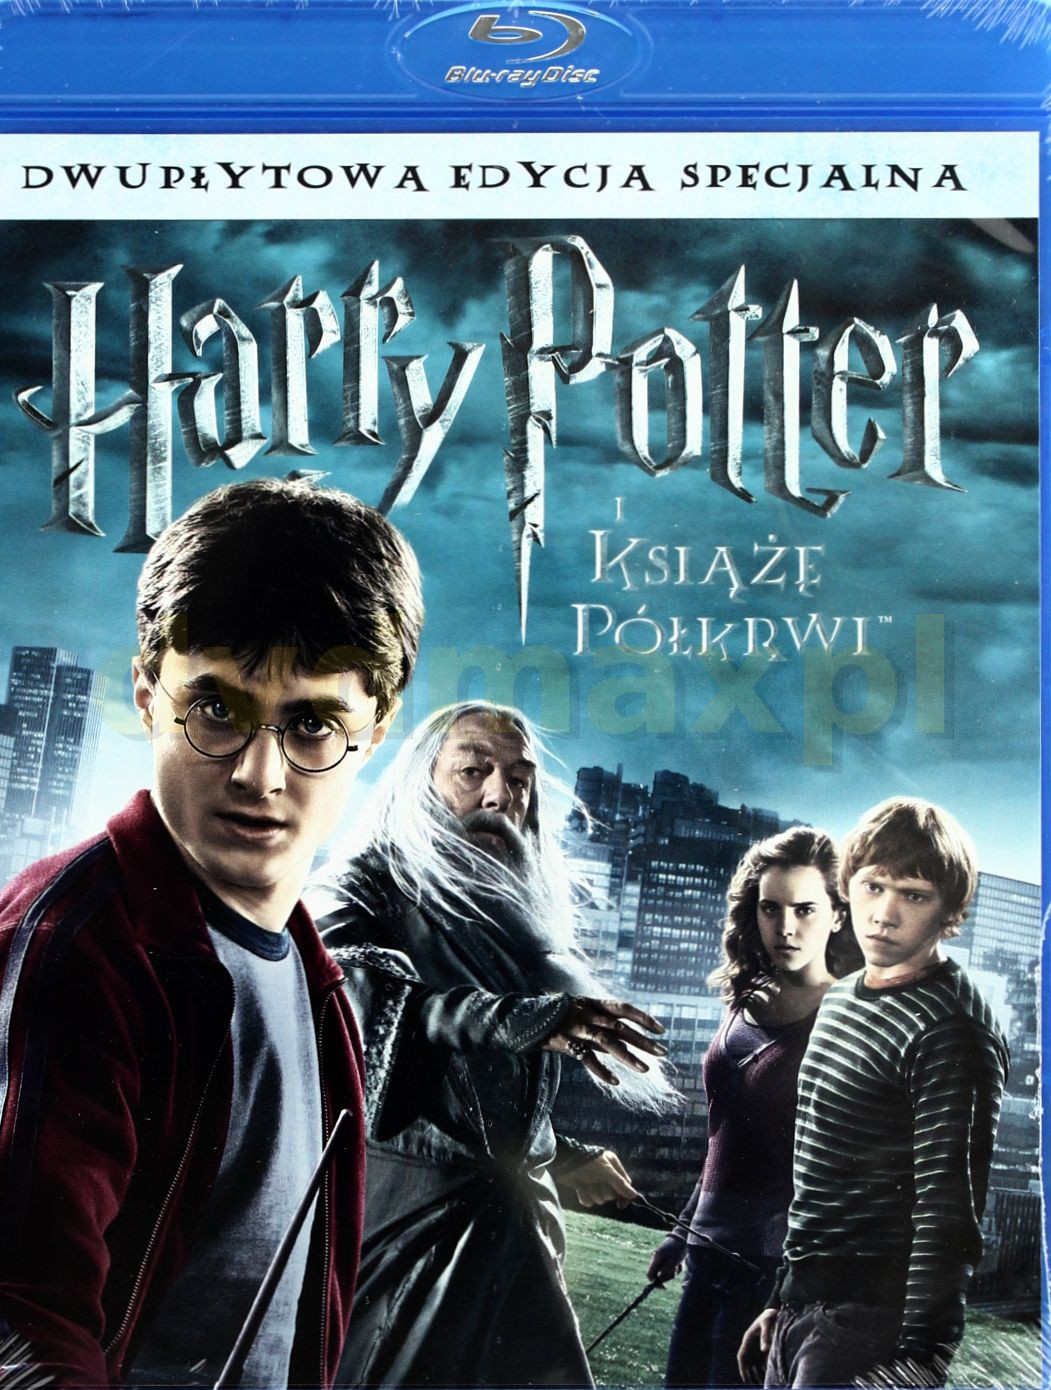 HARRY POTTER I KSIAZE POLKRWI PDF